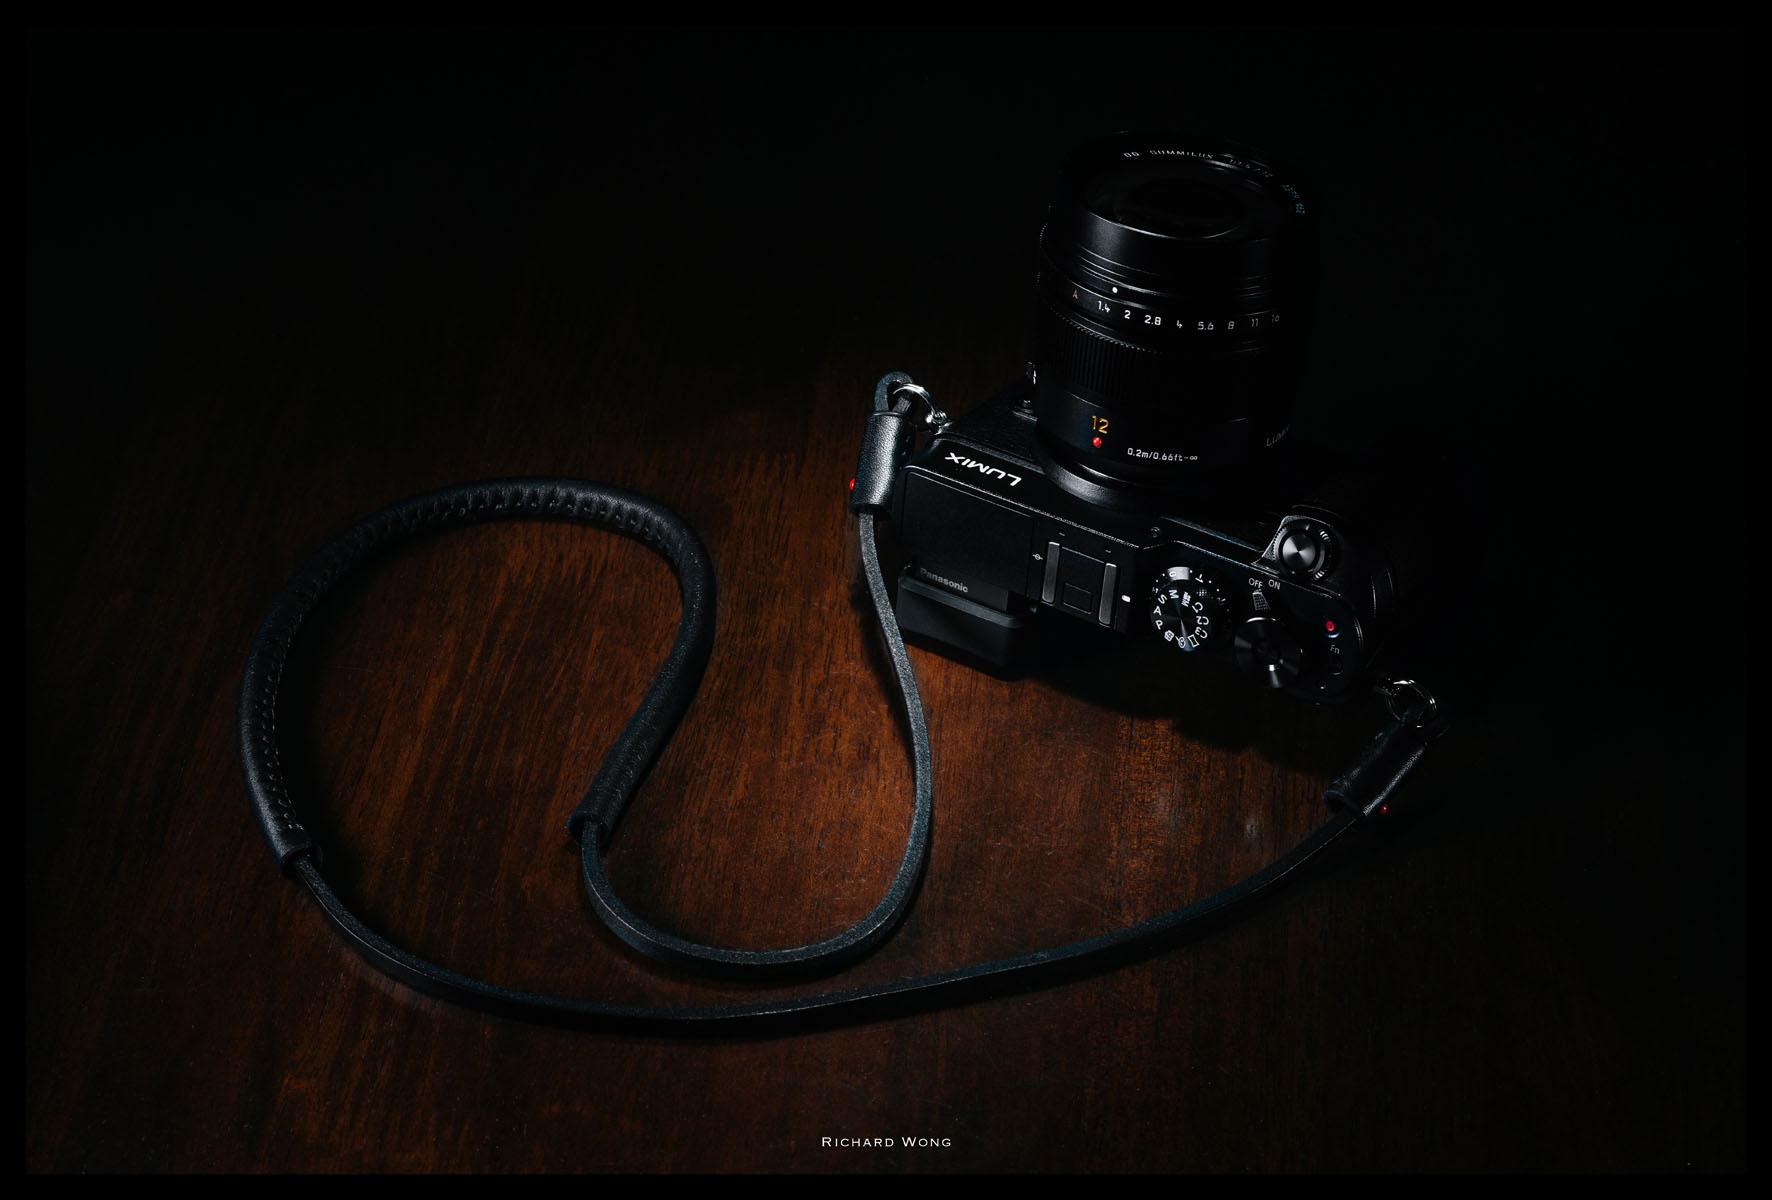 Deadcameras-strap-review-05